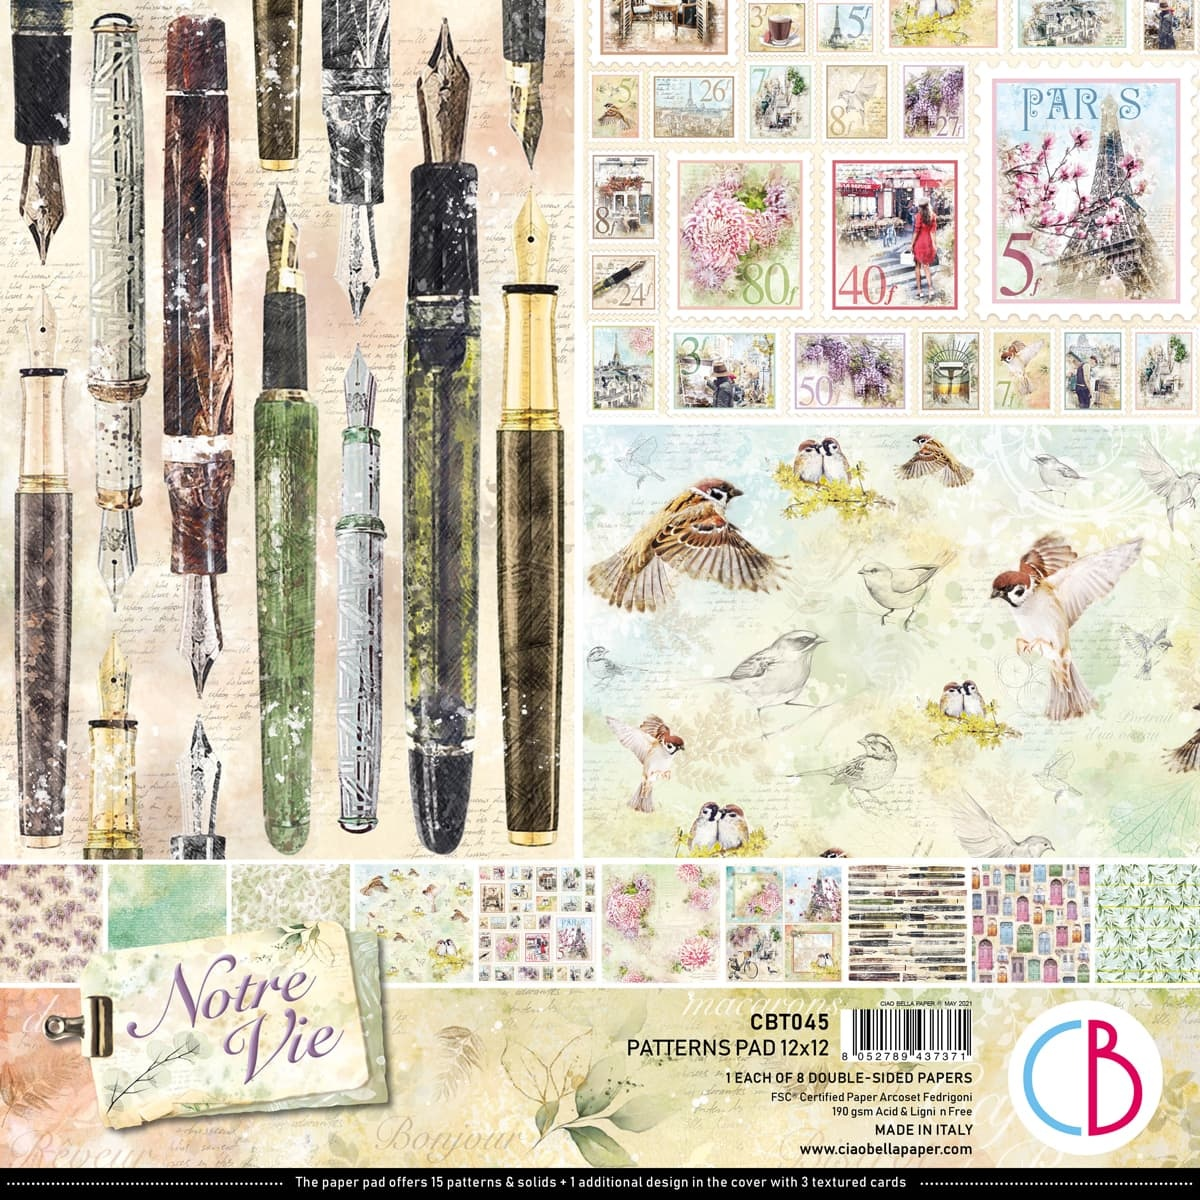 Ciao Bella Double-Sided Paper Pack 90lb 12X12 8/Pkg-Notre Vie, 8 Designs/1 Eac...